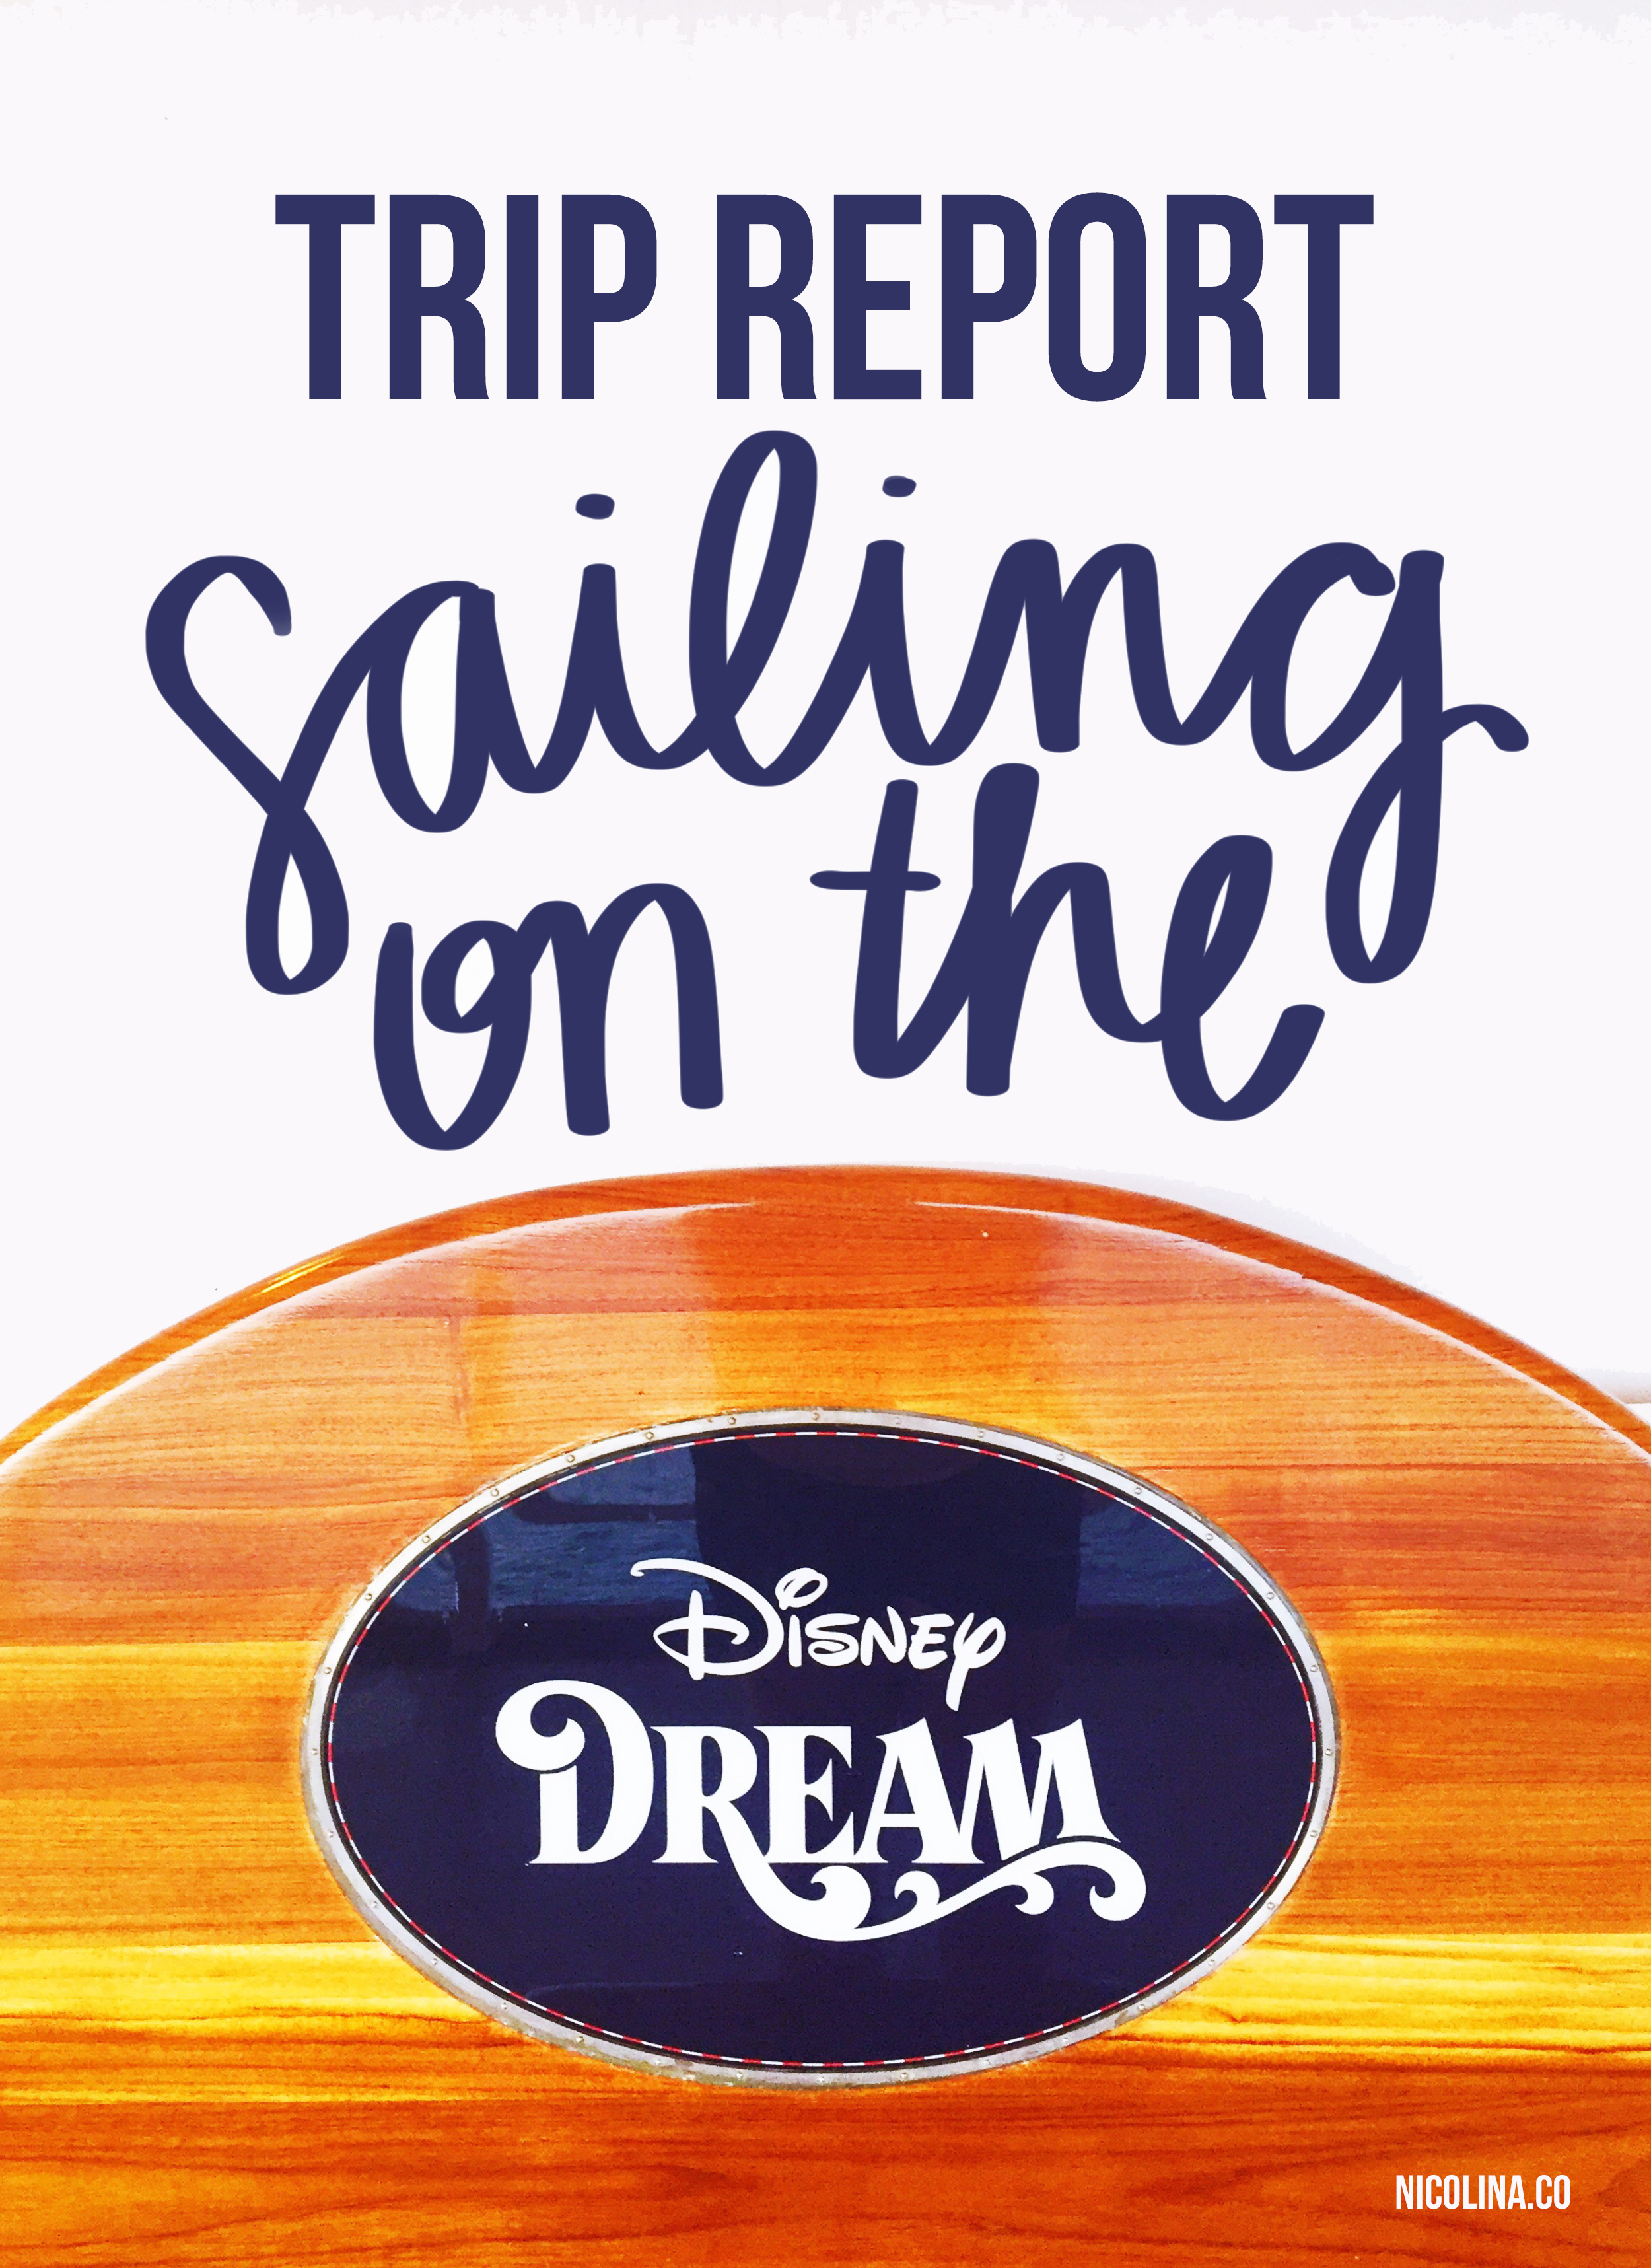 Trip Report - Sailing on the Disney Dream